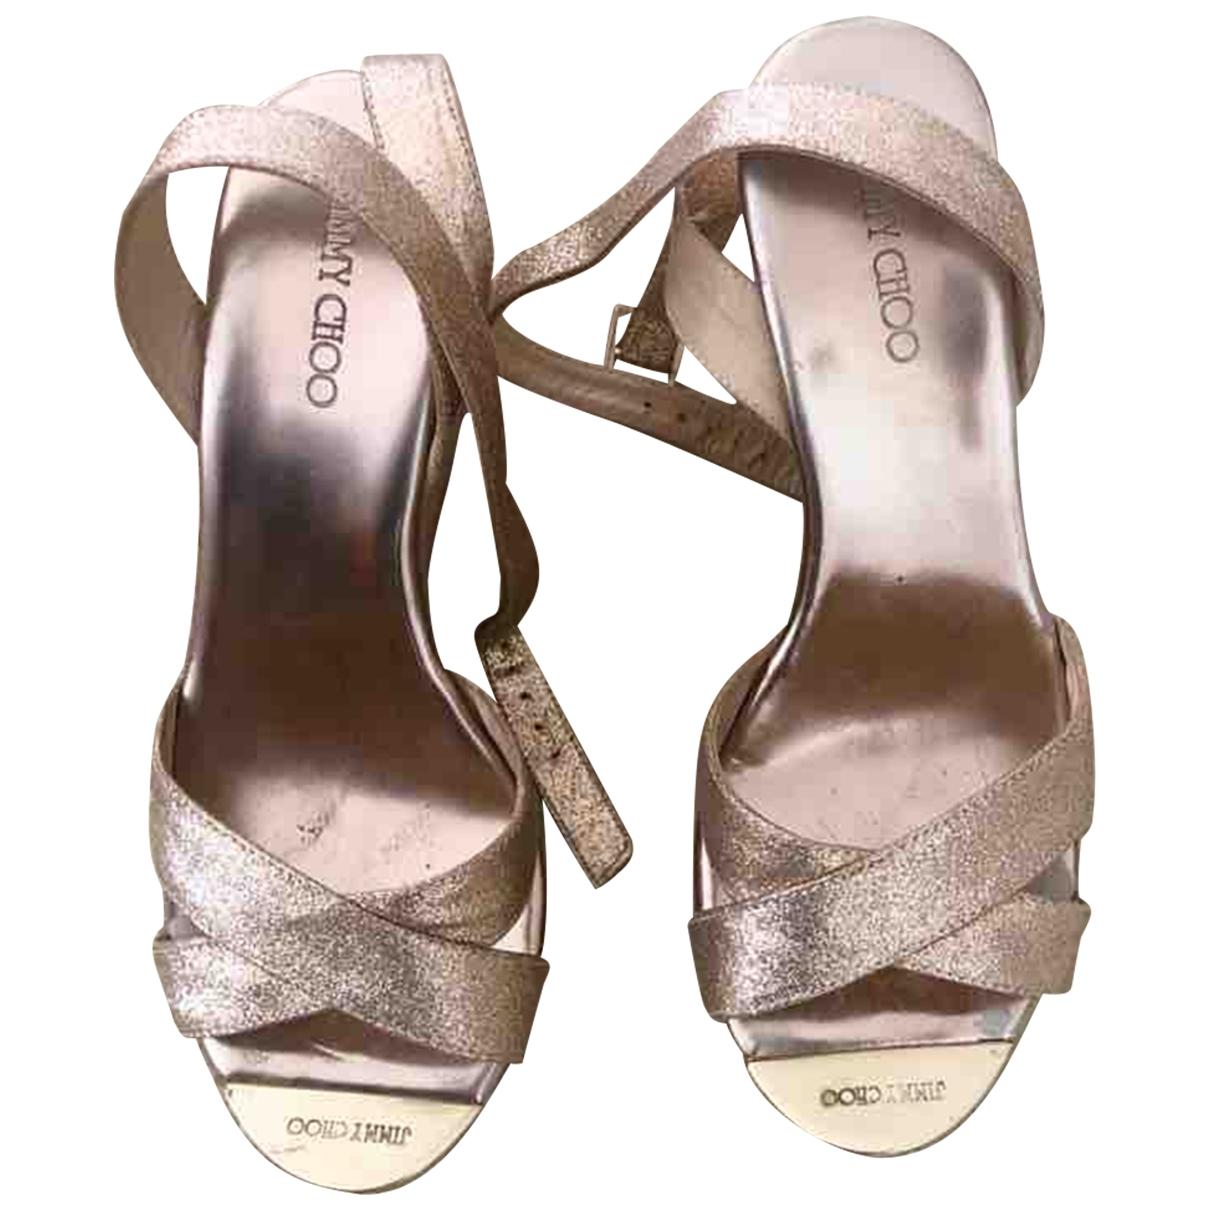 Jimmy Choo \N Beige Patent leather Sandals for Women 38 EU